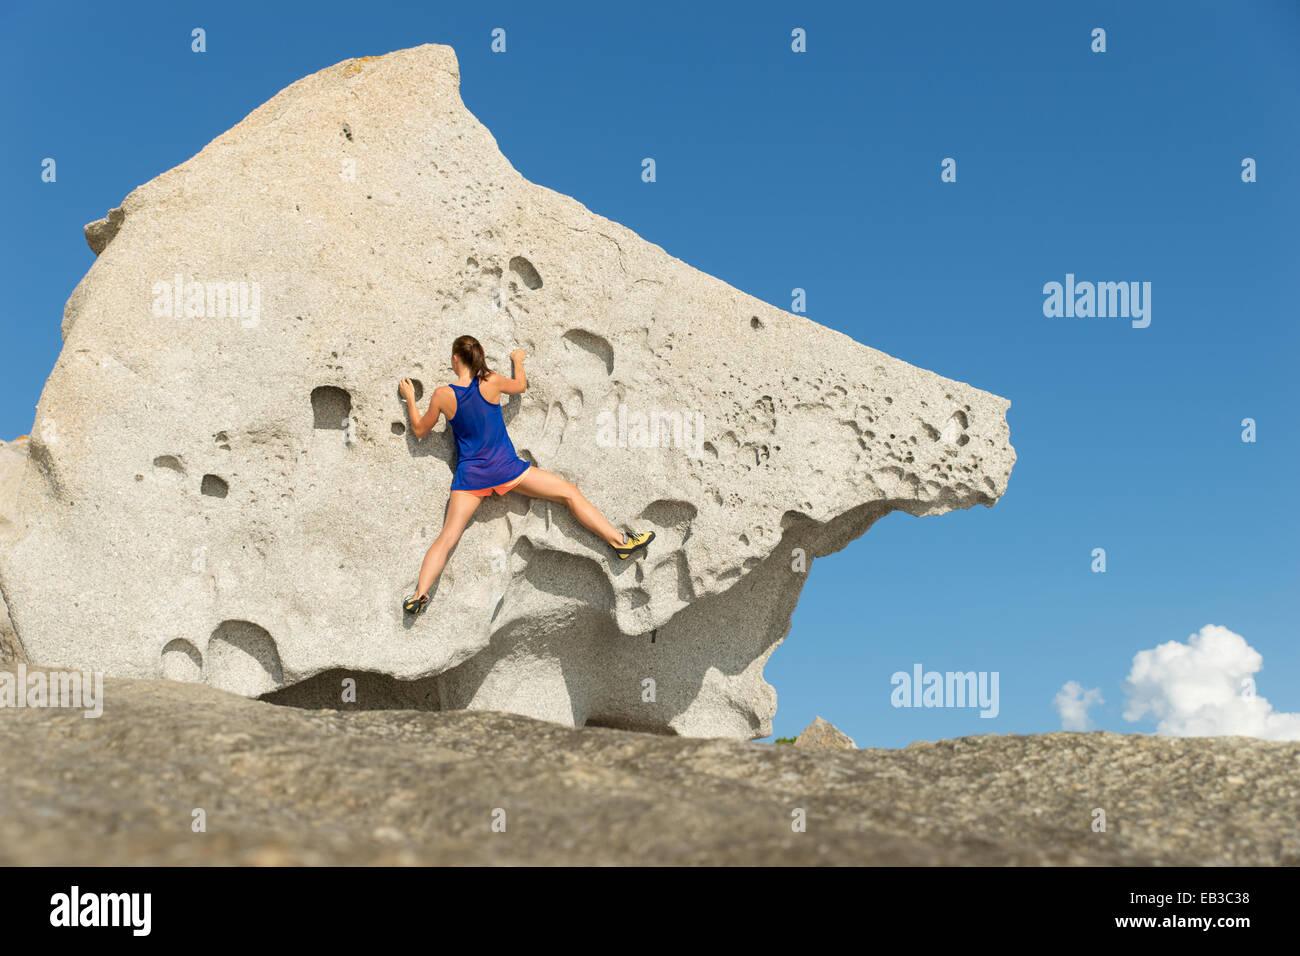 France, Corse, jeune femme escalade big rock Photo Stock